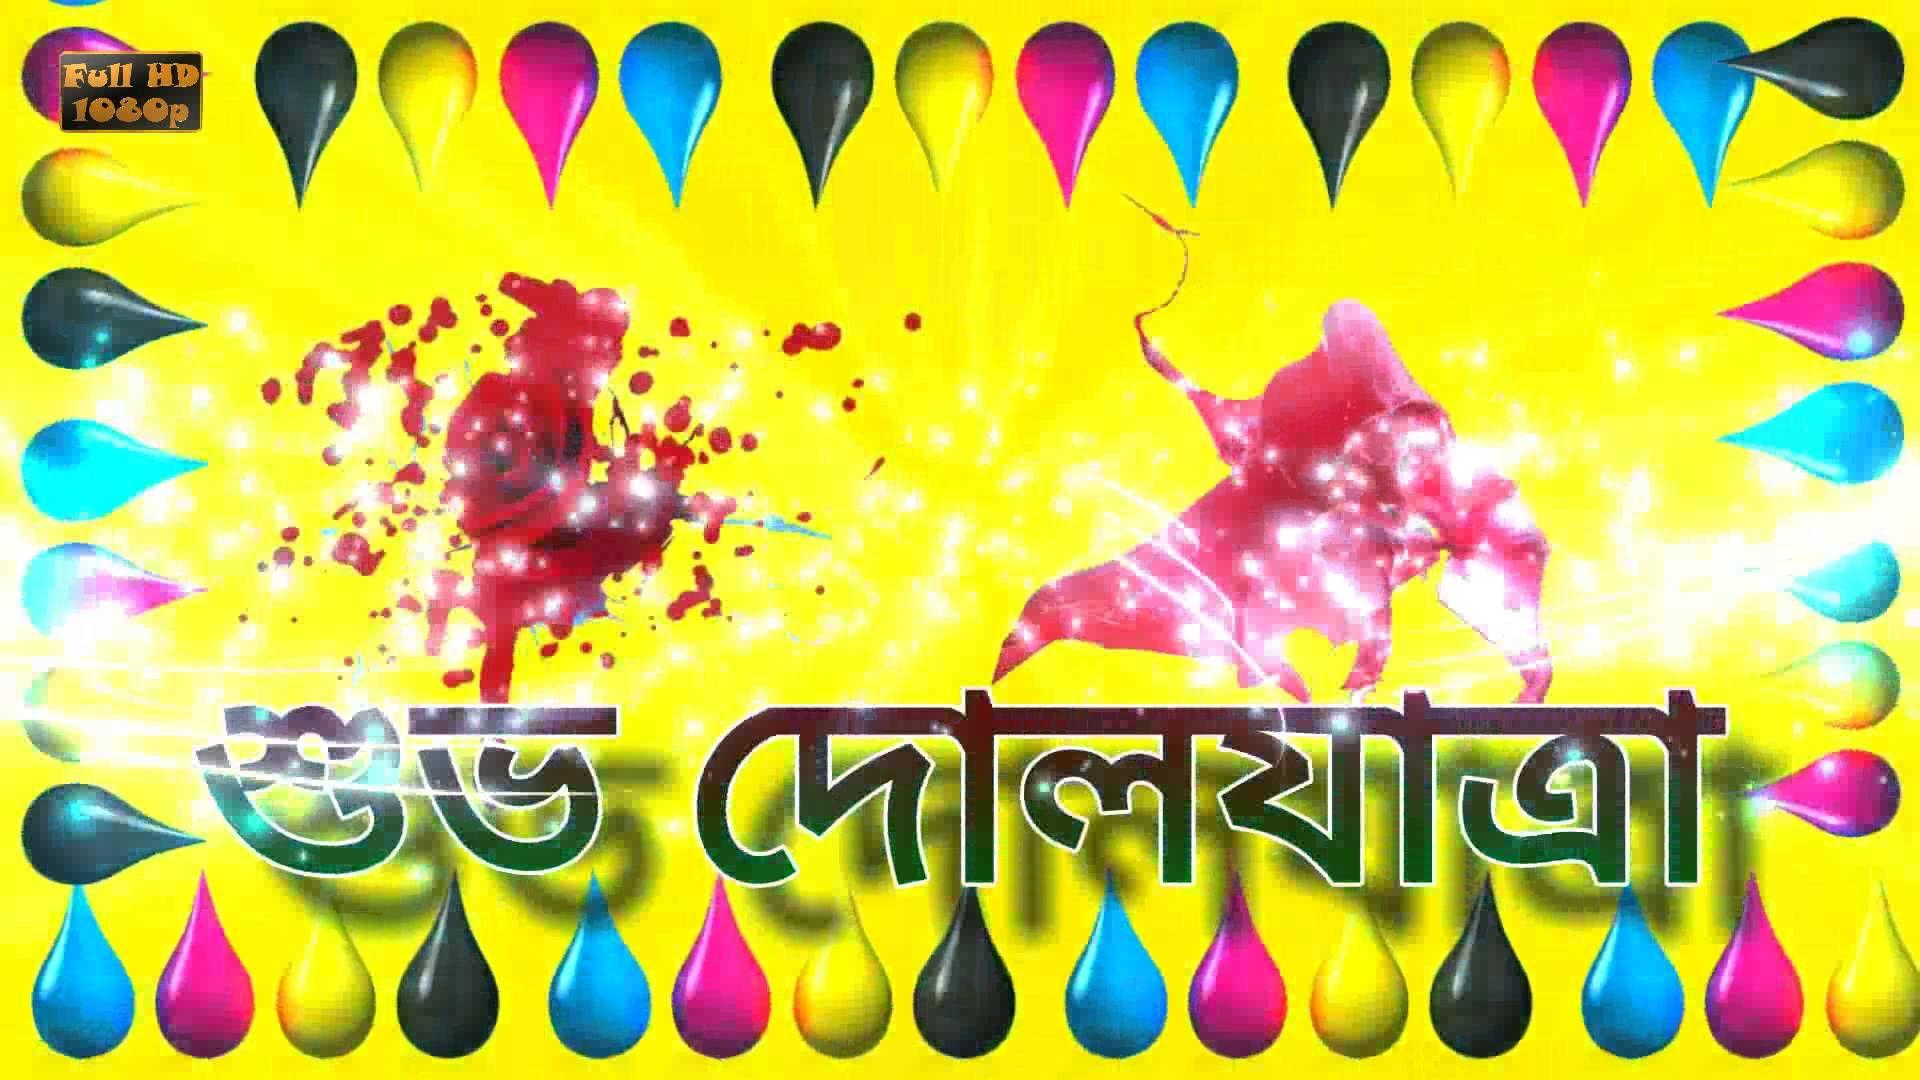 Happy holi wishes in bengali holi greetings in bengali basanta happy holi wishes in bengali holi greetings in bengali basanta utsav v m4hsunfo